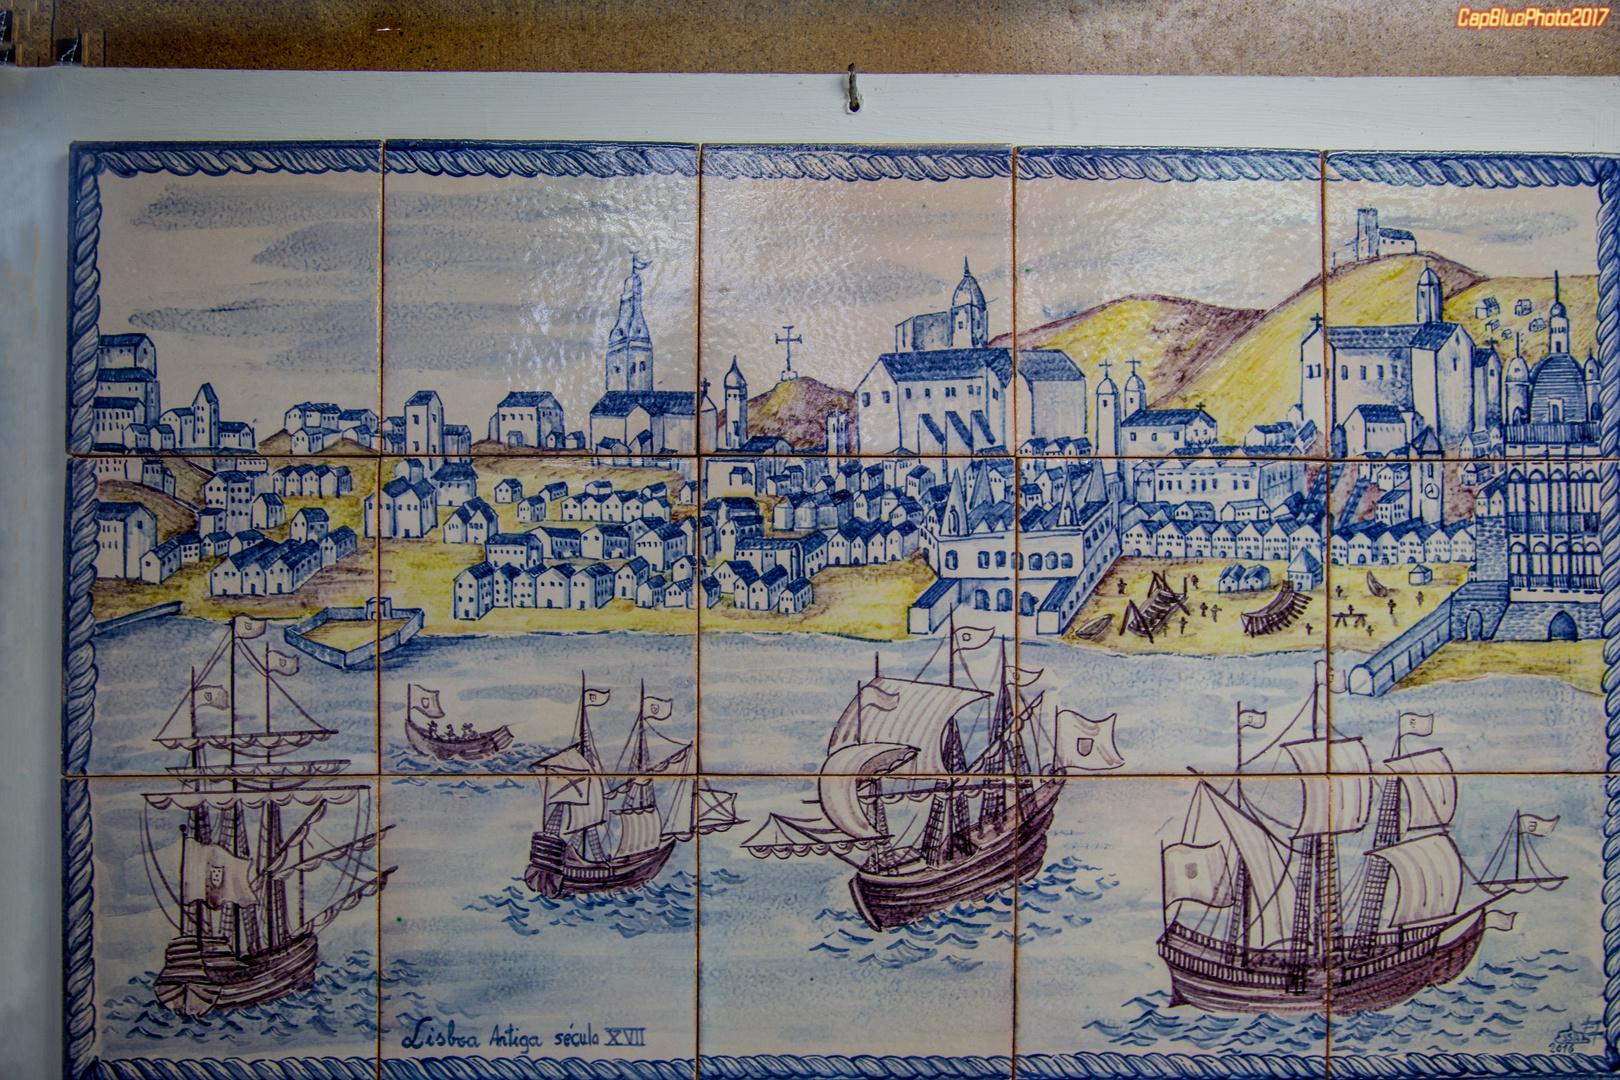 Azulejos de azeitao lisboa im 17 jahrhundert foto bild for Azulejos europa 9 telefono